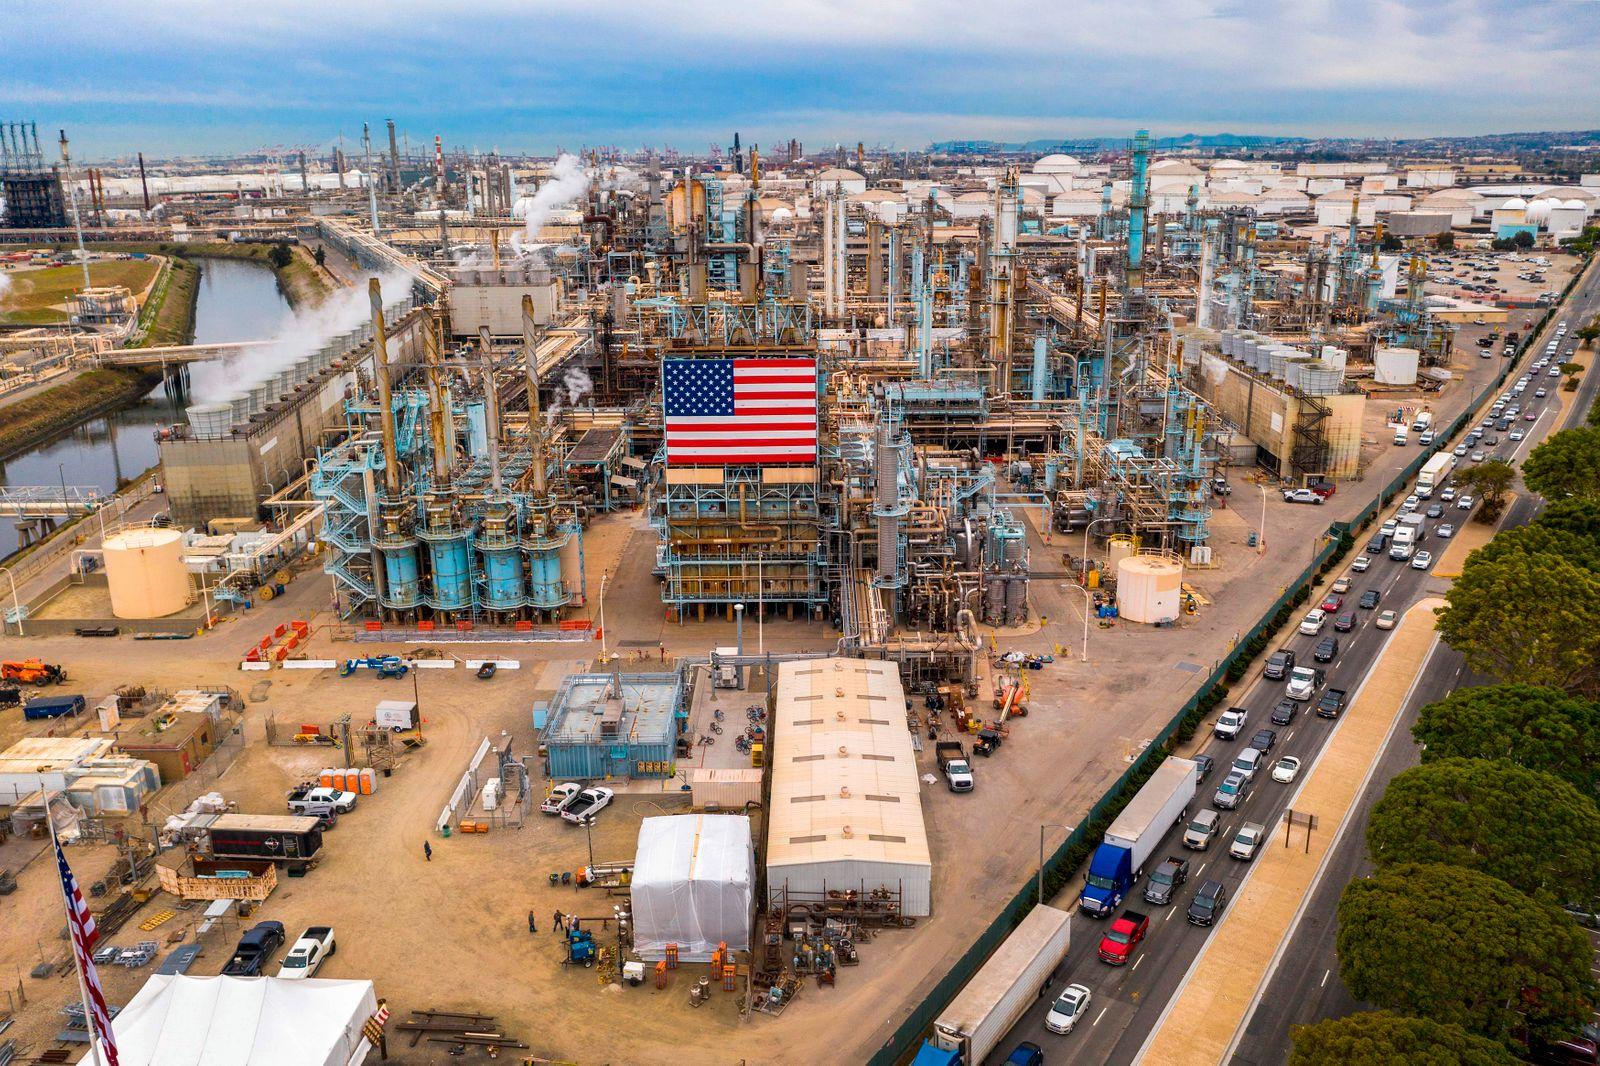 US-MARKETS-WORLD-OIL